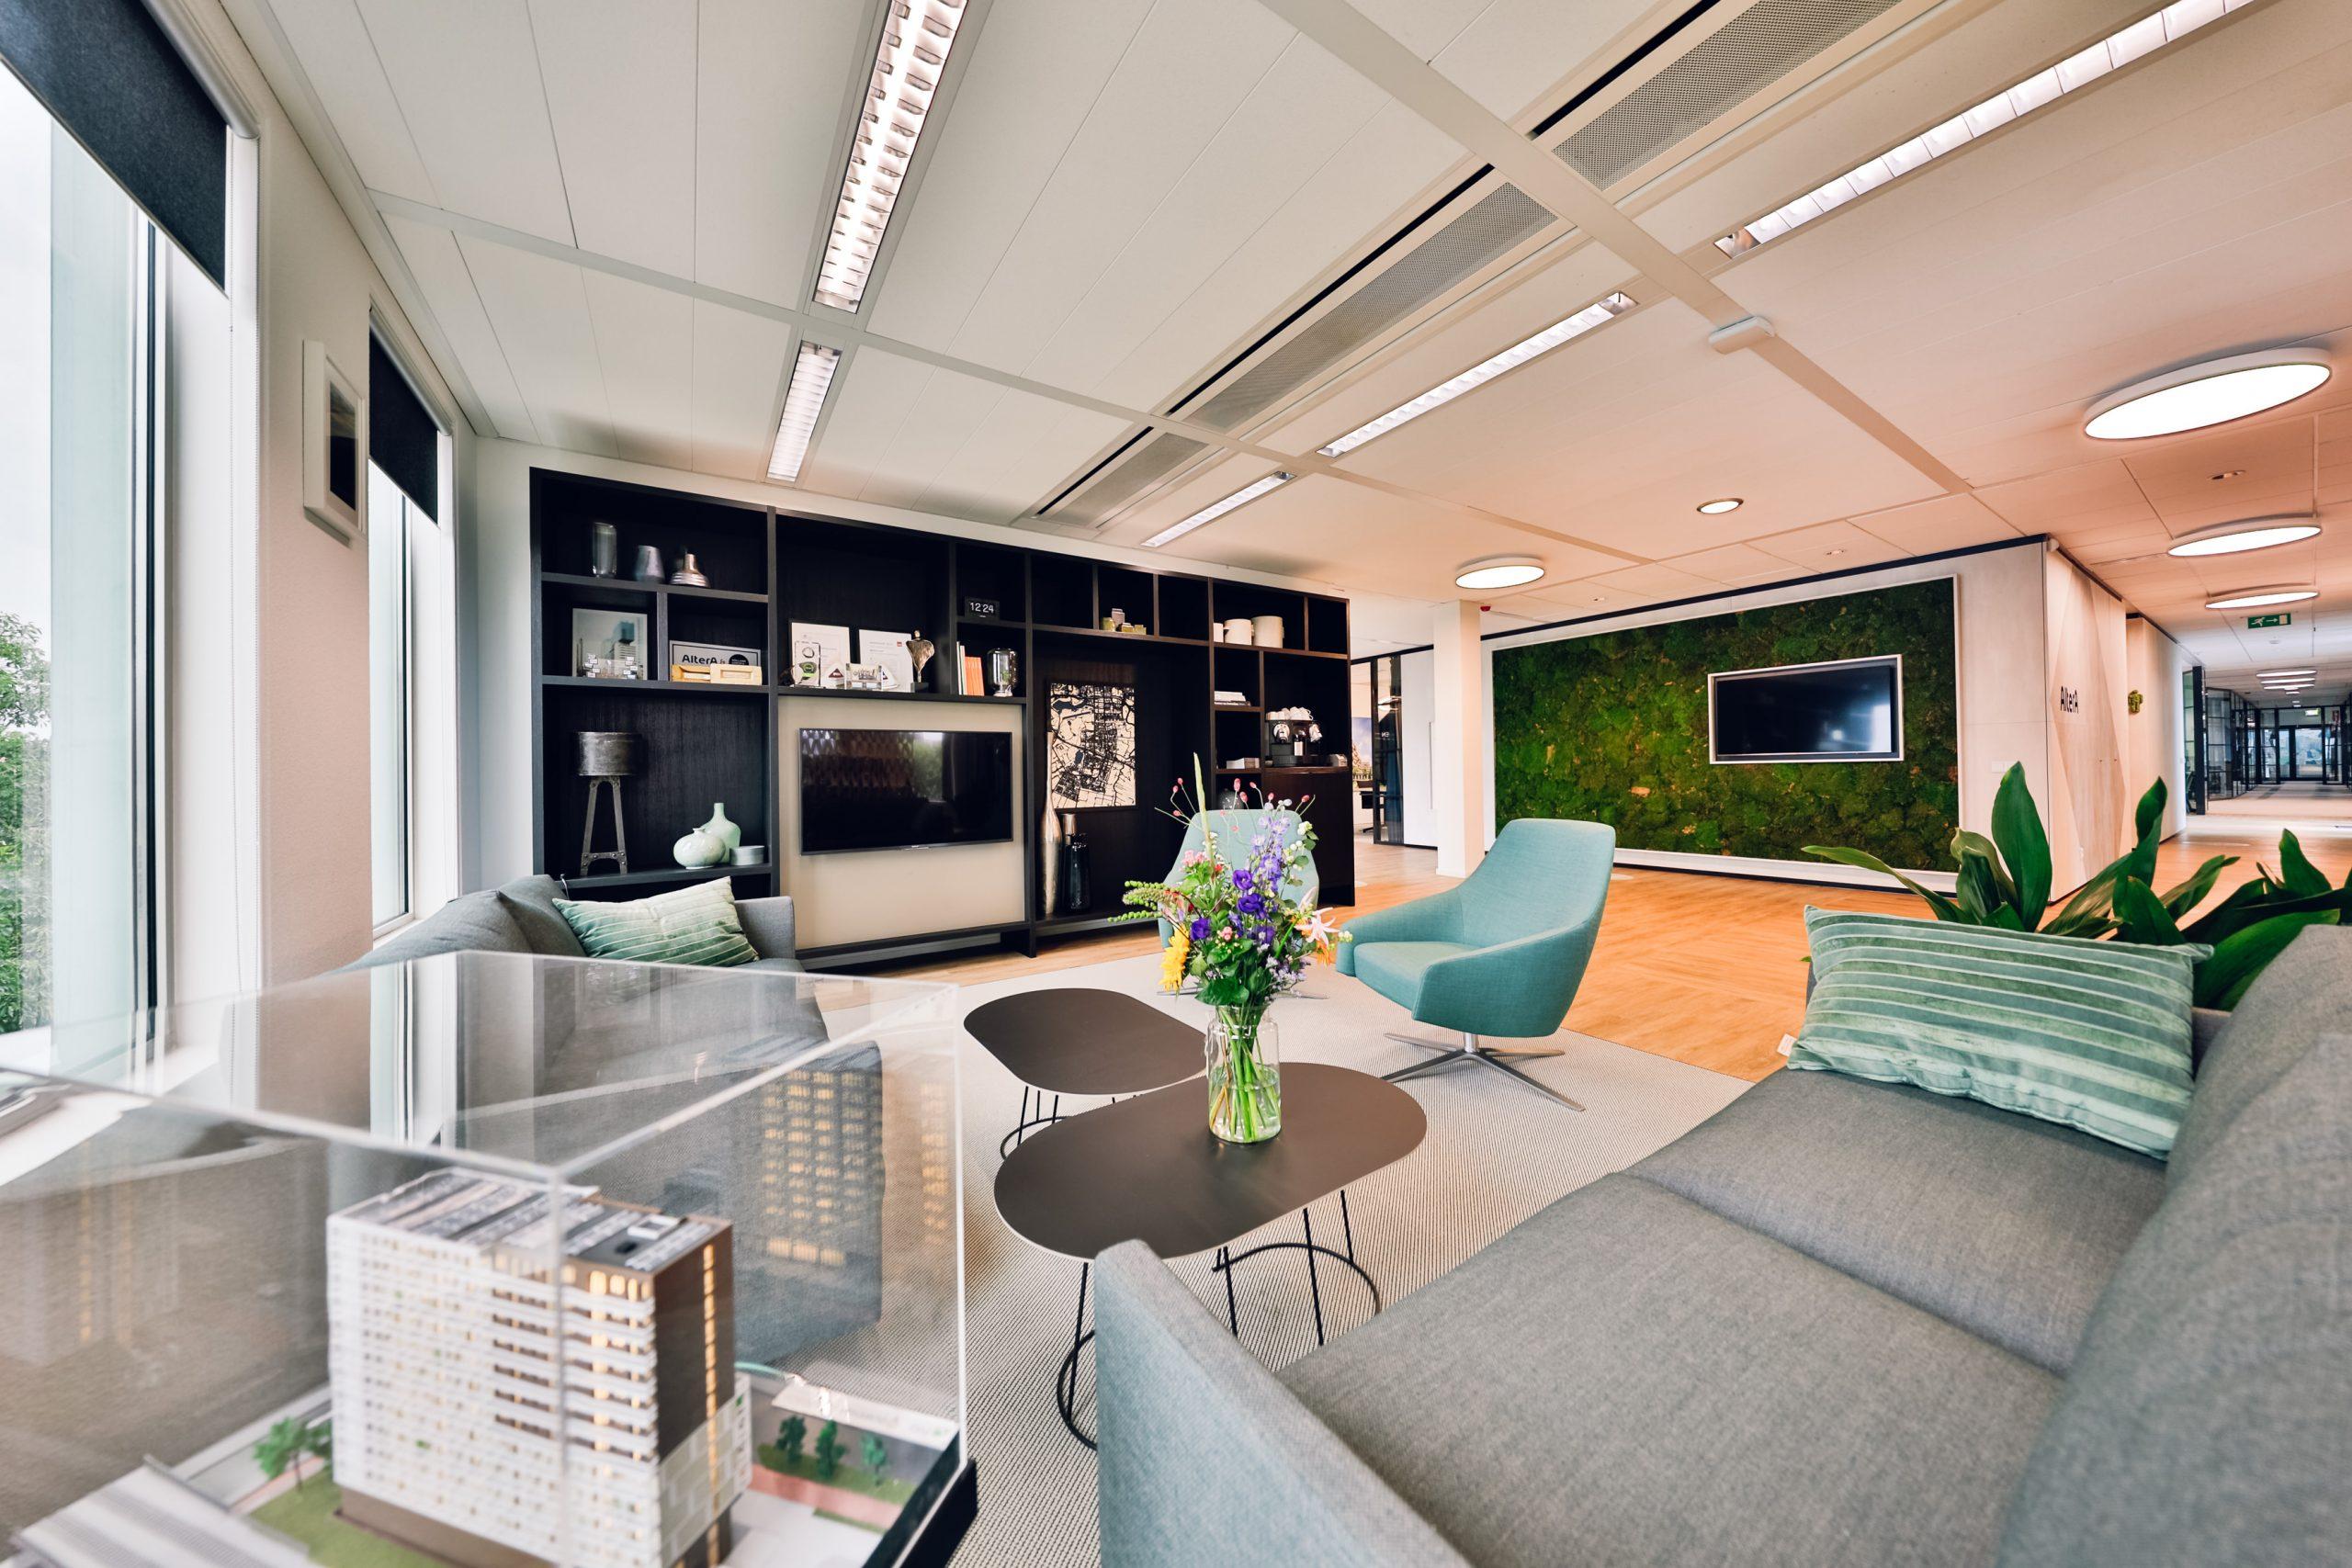 Livingroom fkk Purenudism Pics